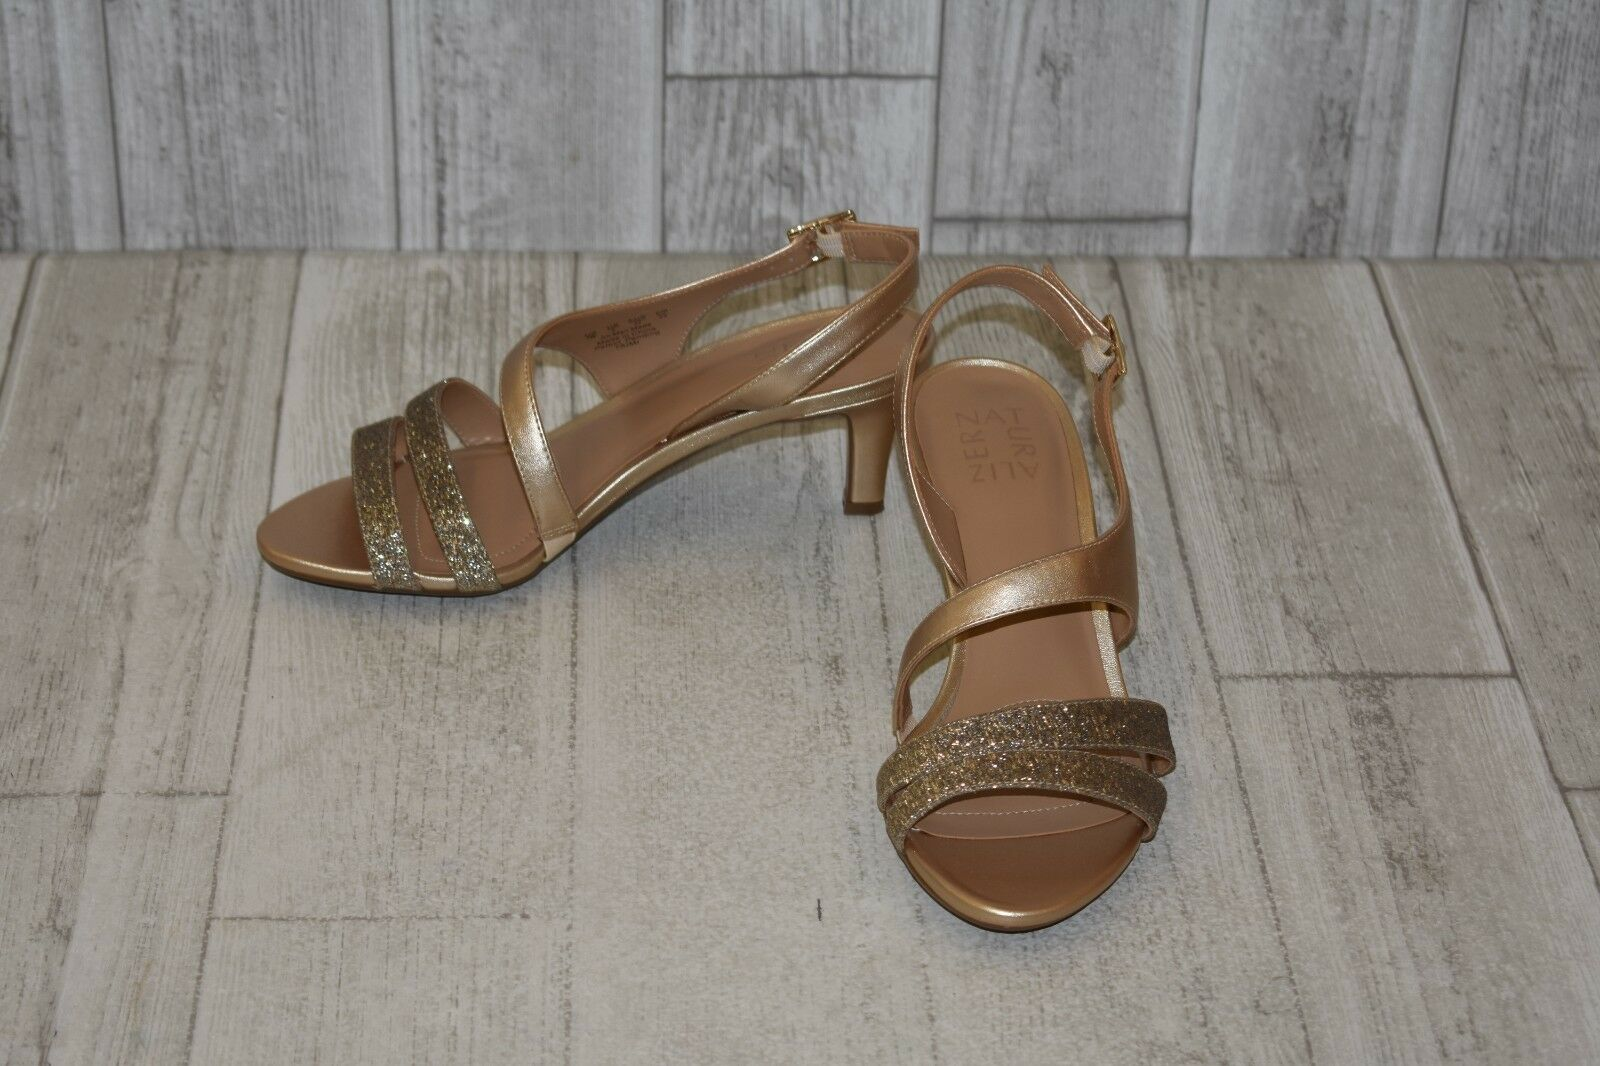 Naturalizer Taimi Heels, Women's Size 7 W, gold